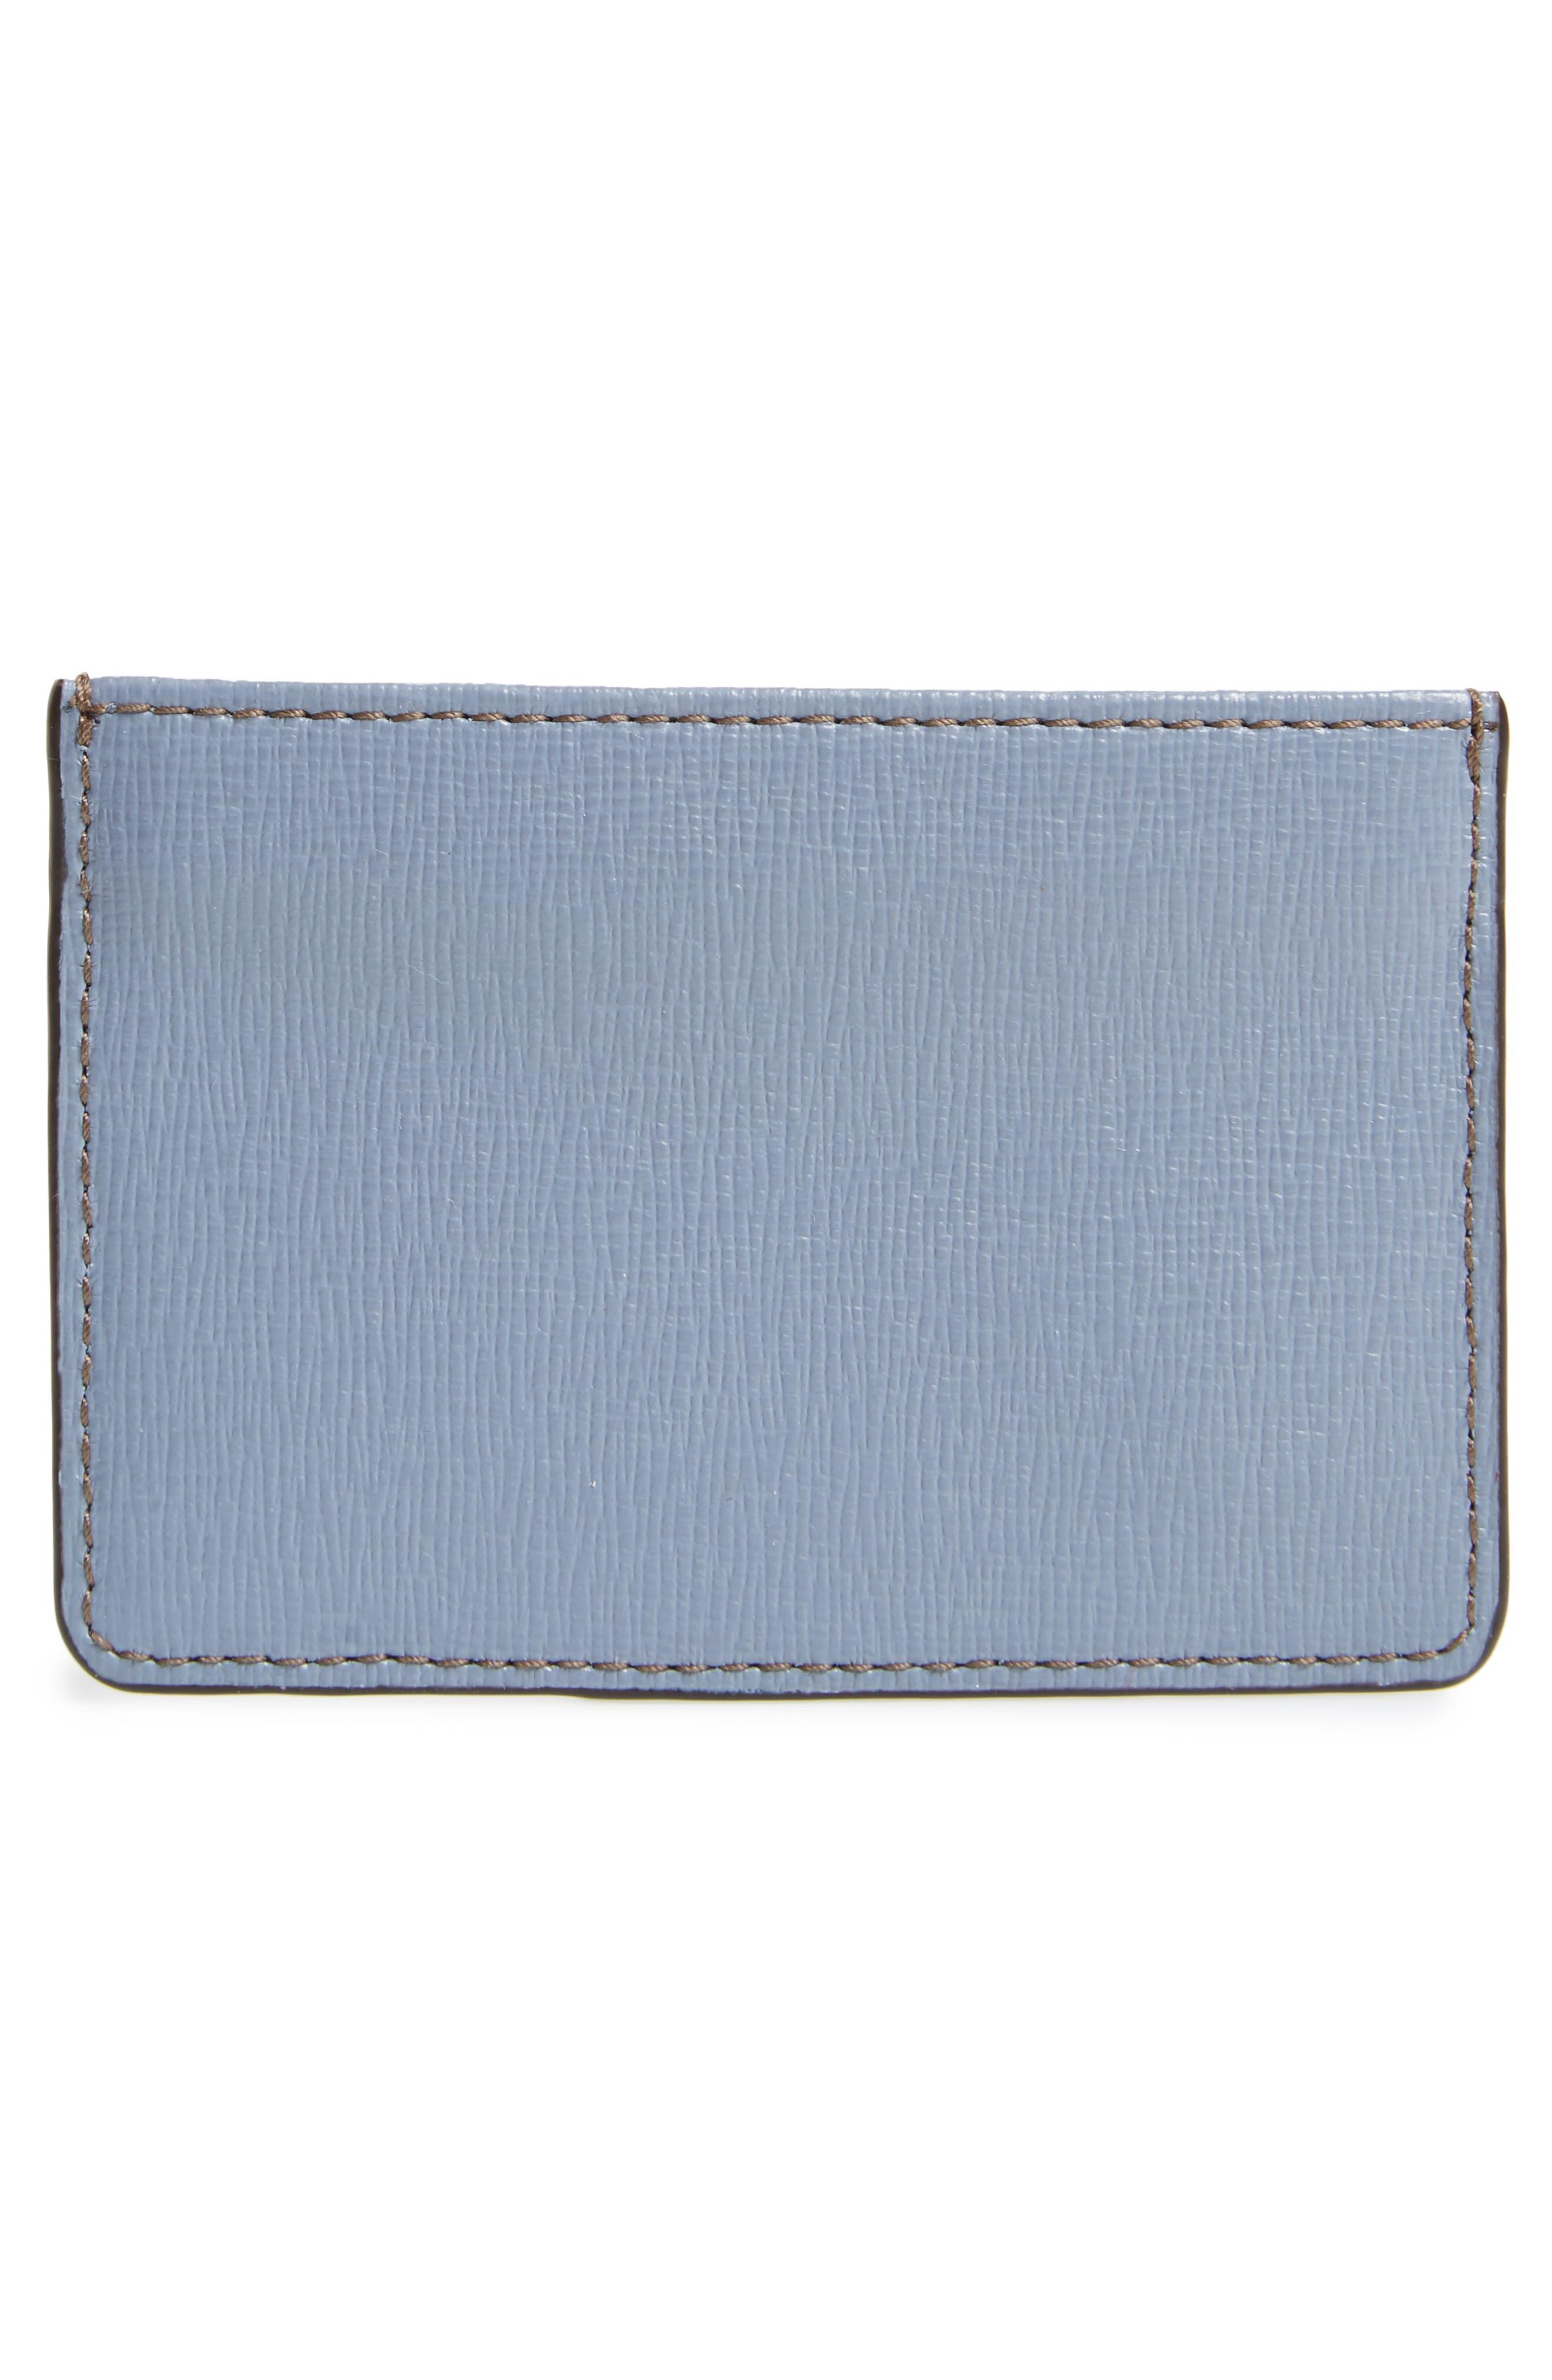 Gioia Saffiano Leather Card Case,                             Alternate thumbnail 5, color,